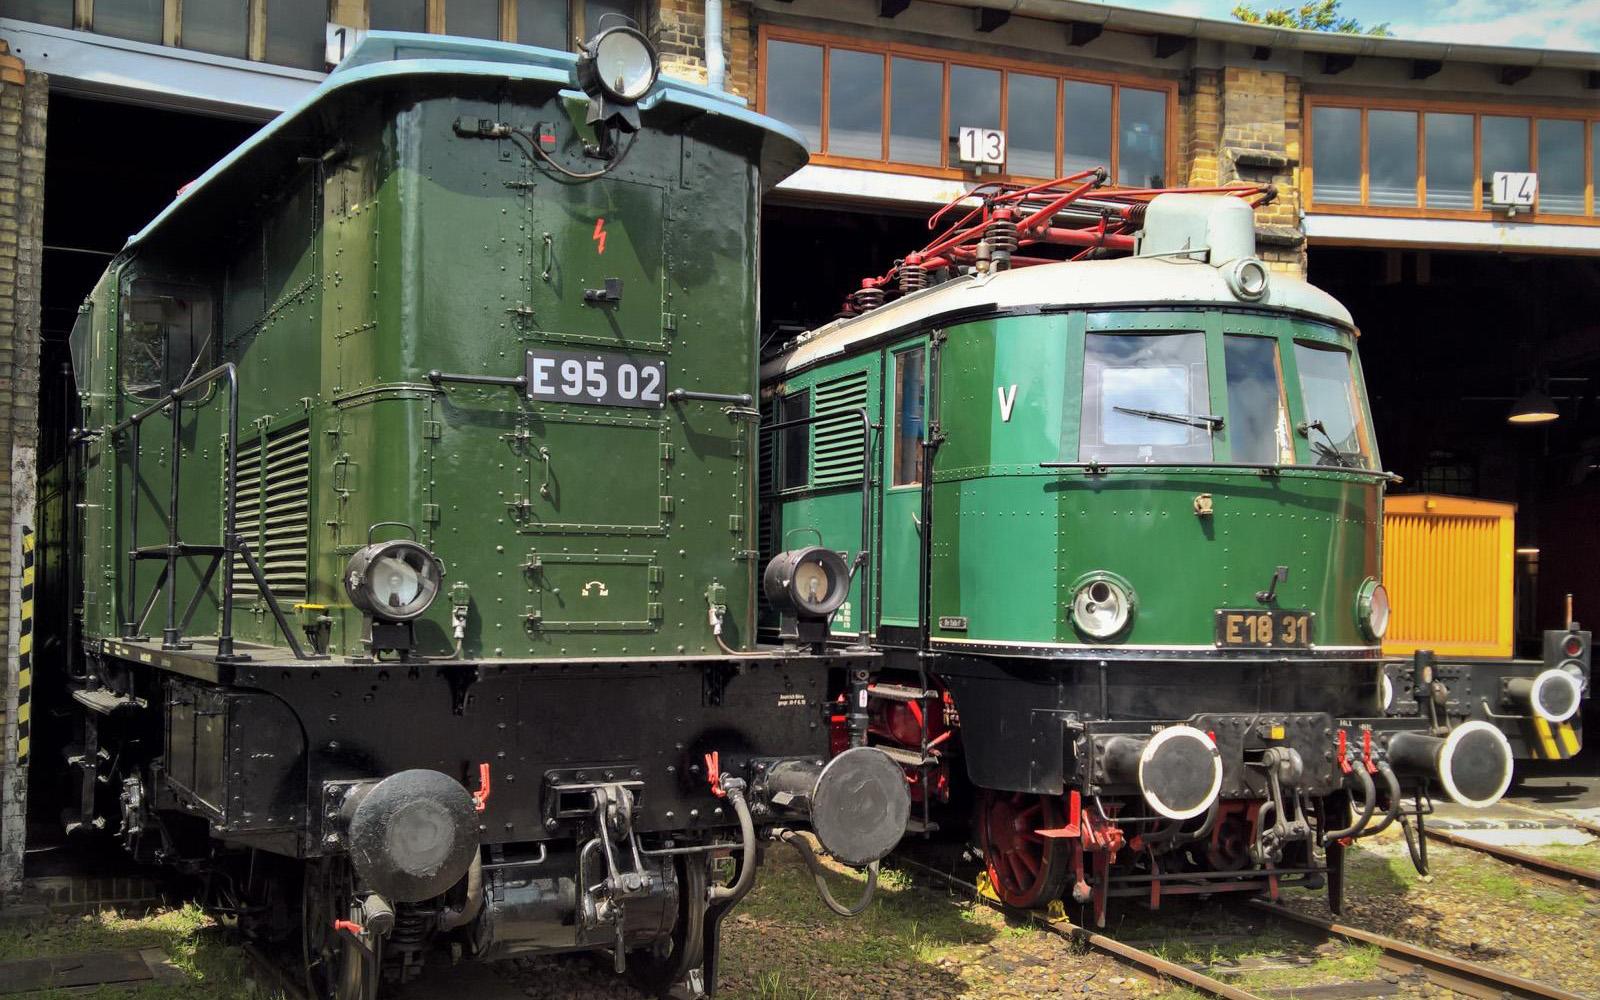 ©Foto: Christian Wodzinski   railmen   Güterzuglokomotive E95 02 im DB Museum Halle   BJ 1927